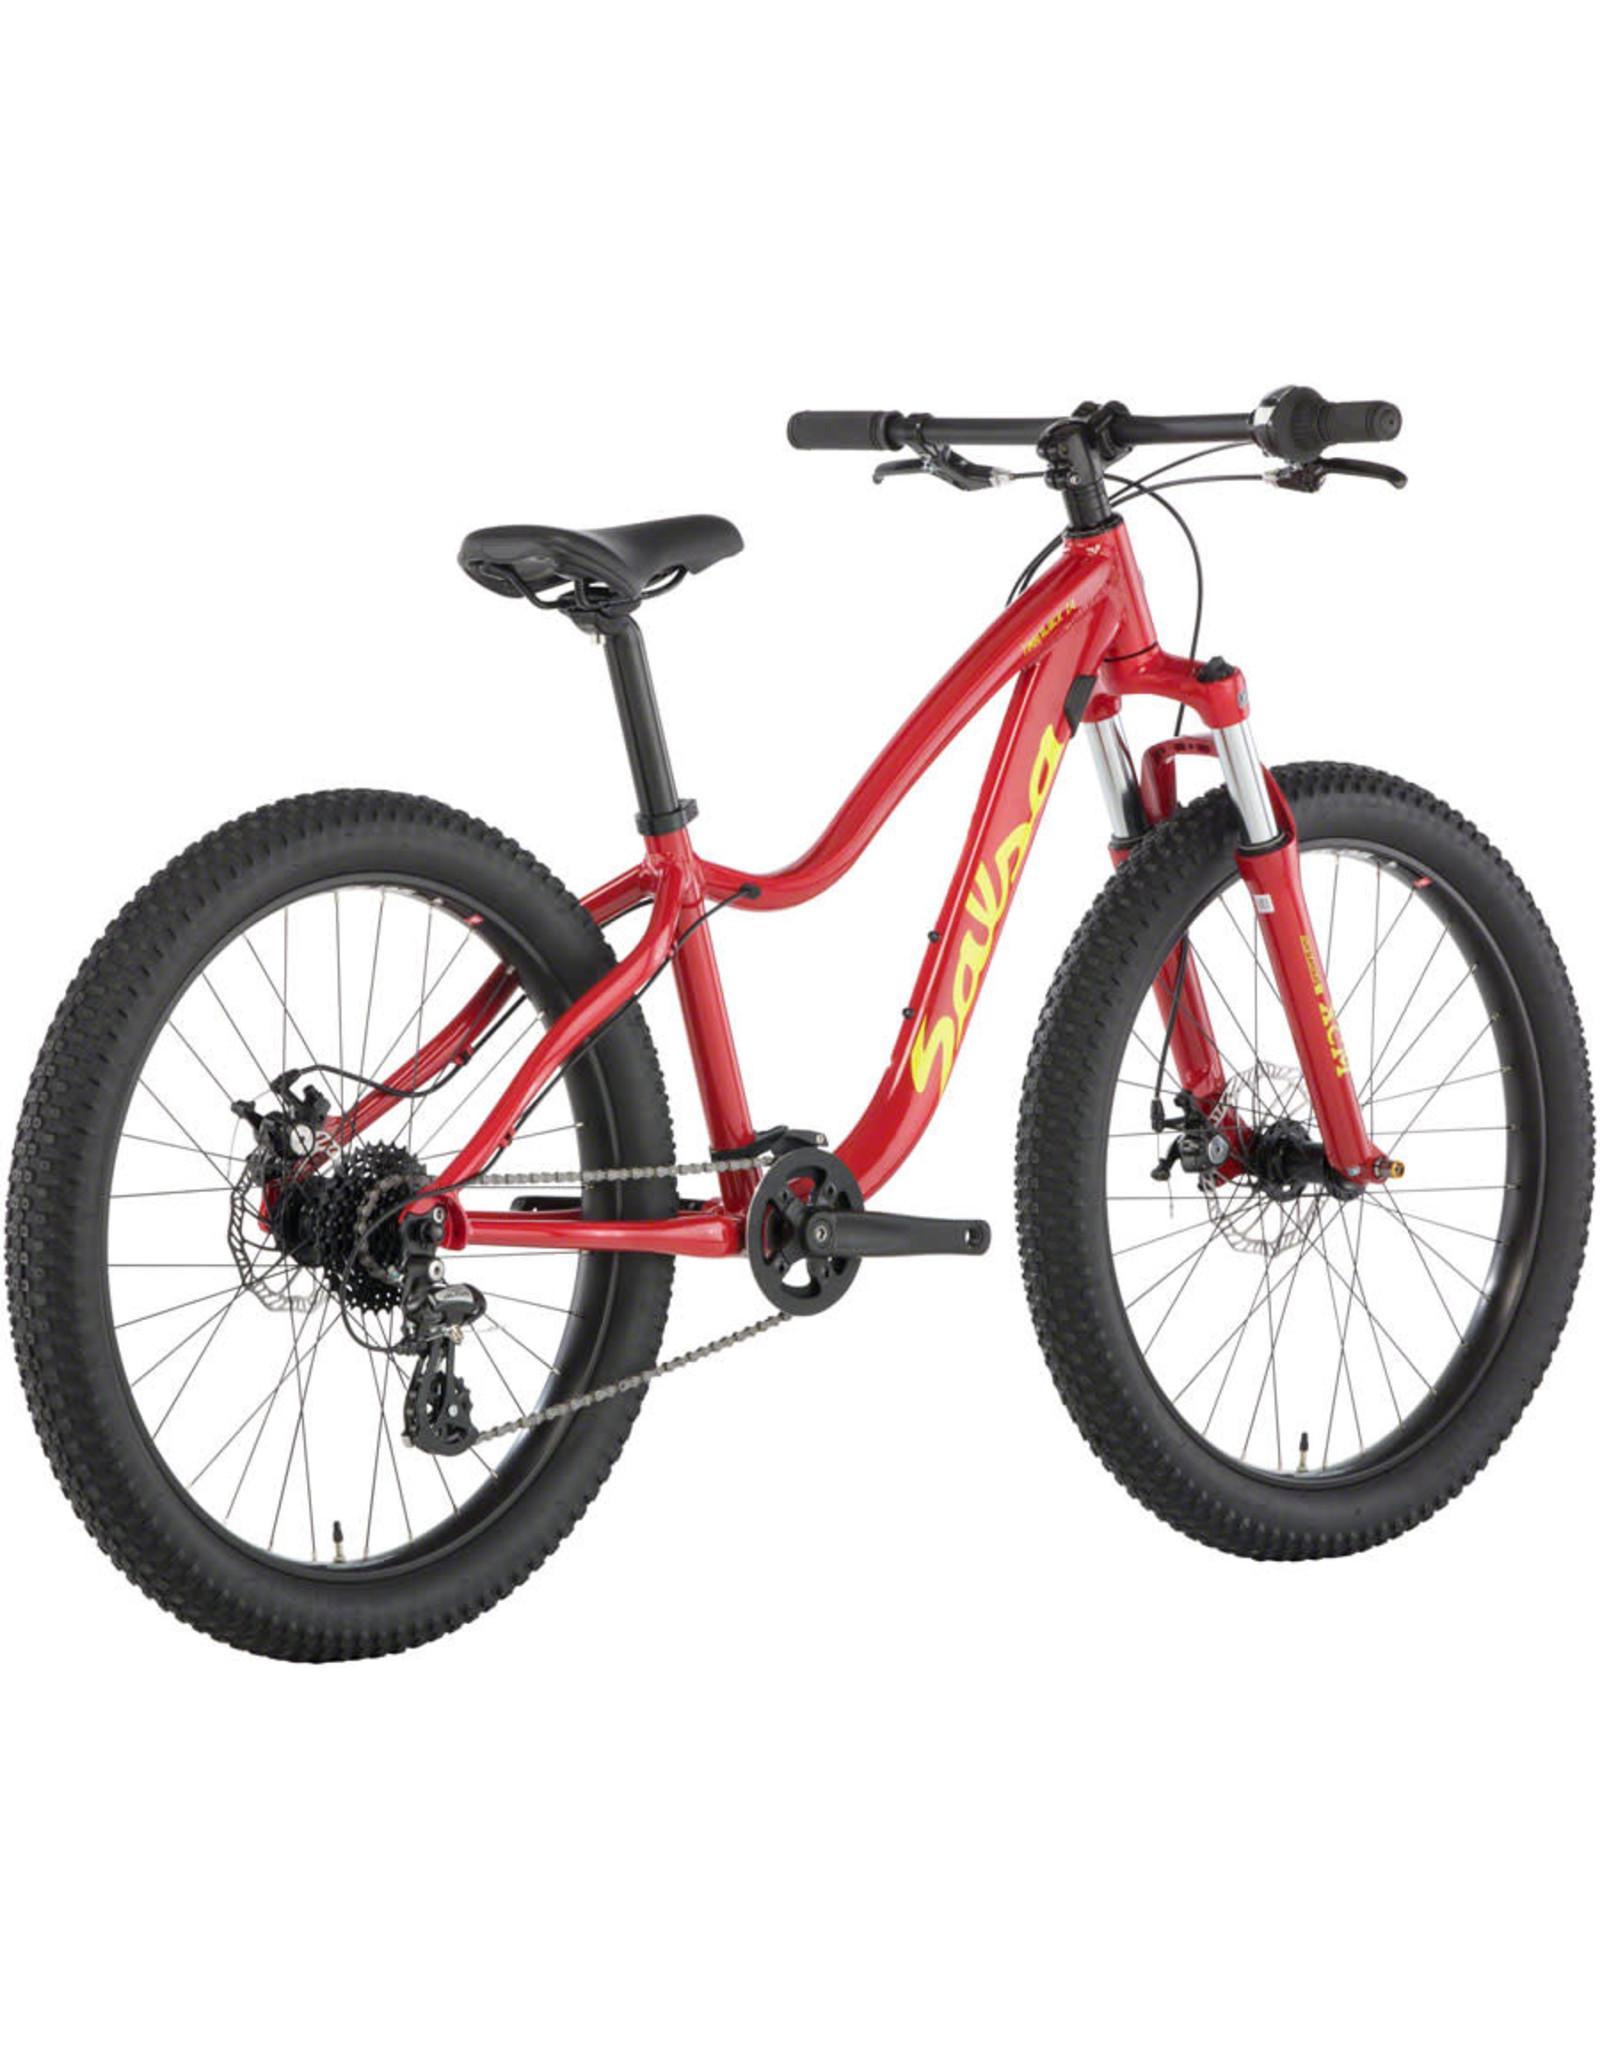 Salsa Salsa Timberjack 24 Sus Bike Red